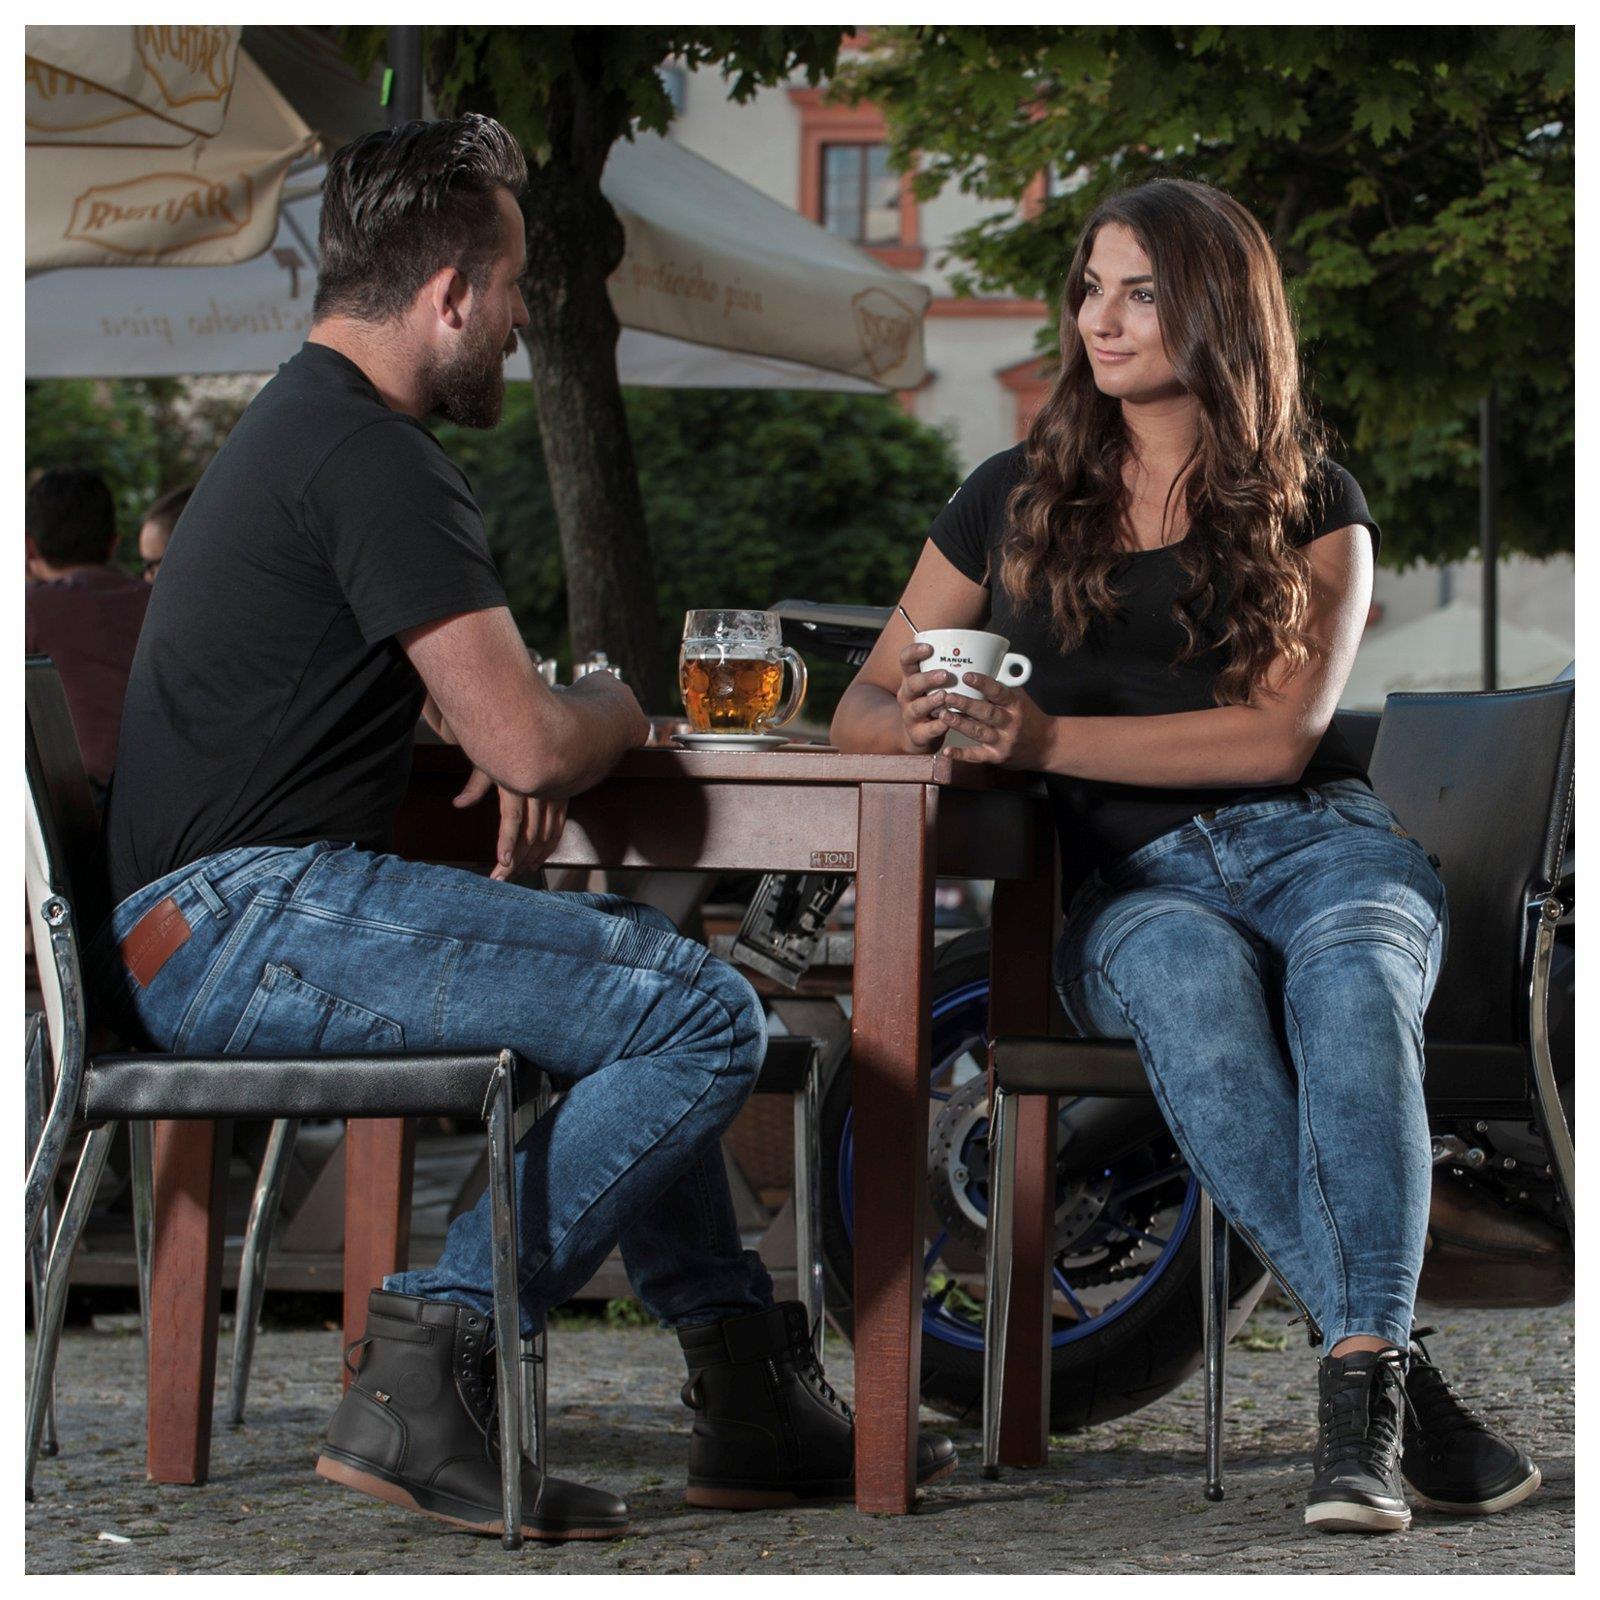 Trilobite-Pantaloni-Moto-Jeans-Abbigliamento-Parado-MICAS-URBAN-DUAL-PANTS-ACID miniatura 95